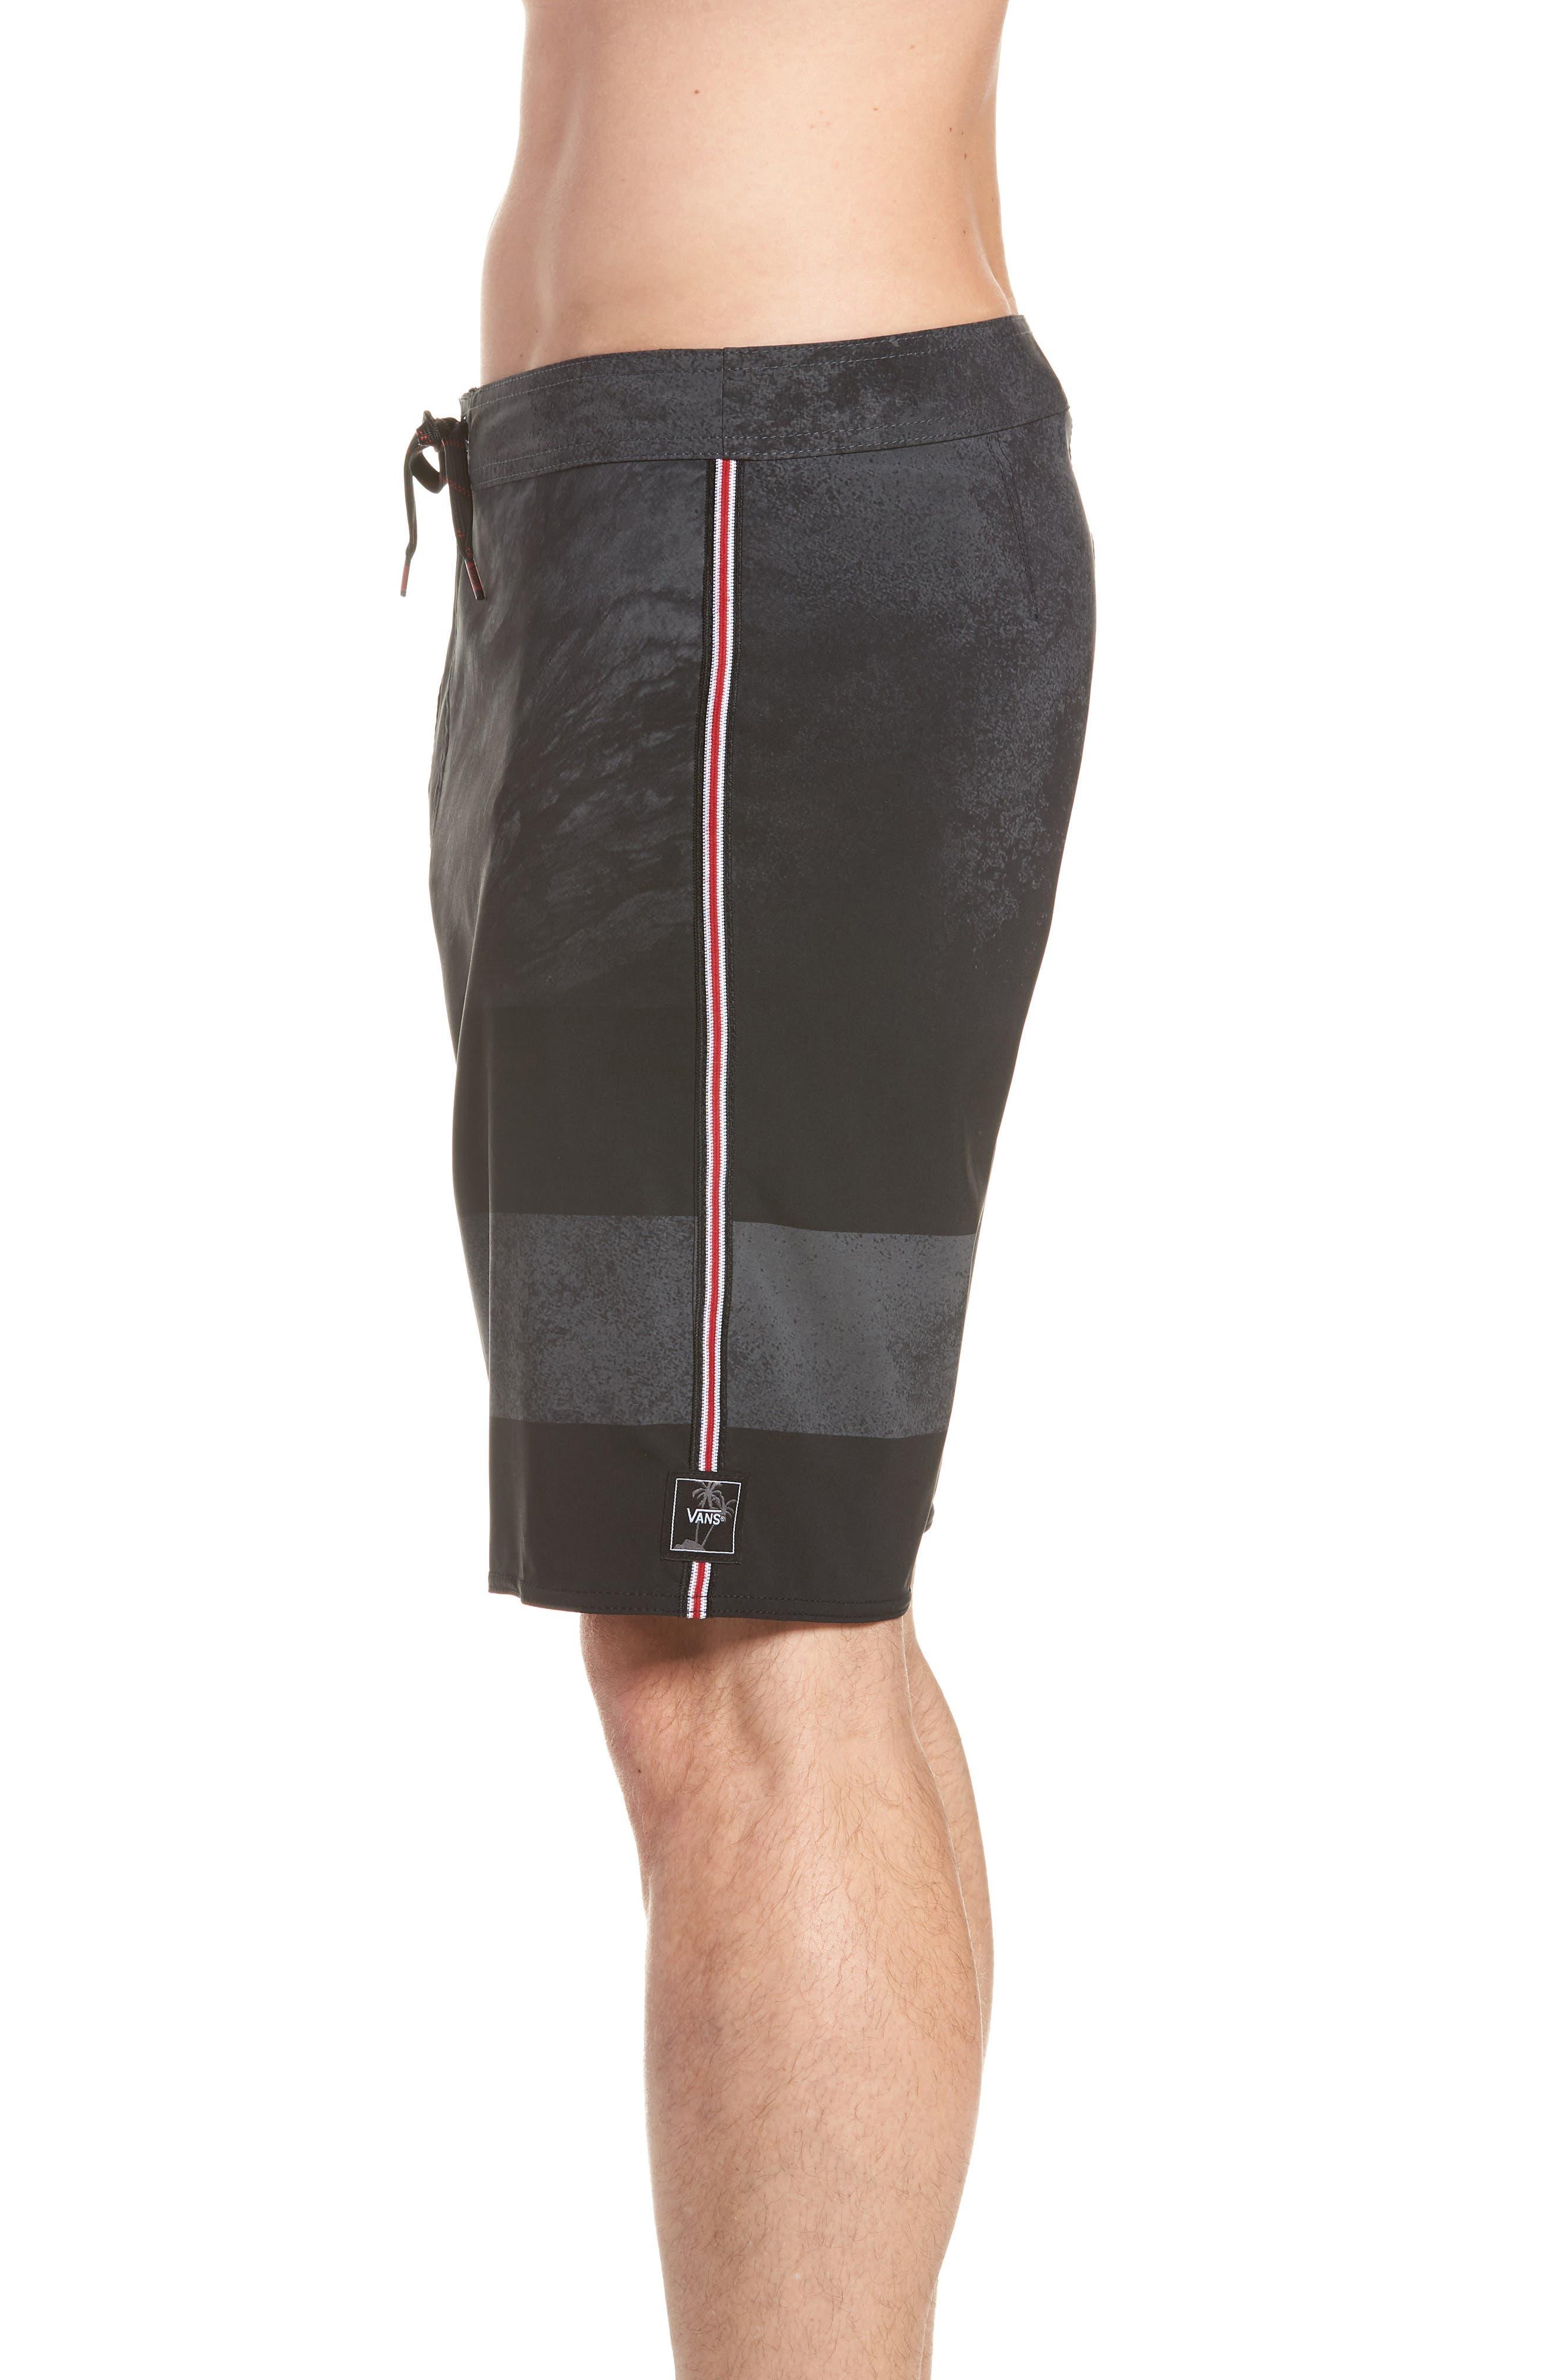 Era Board Shorts,                             Alternate thumbnail 4, color,                             BLACK/ NATHAN FLORENCE